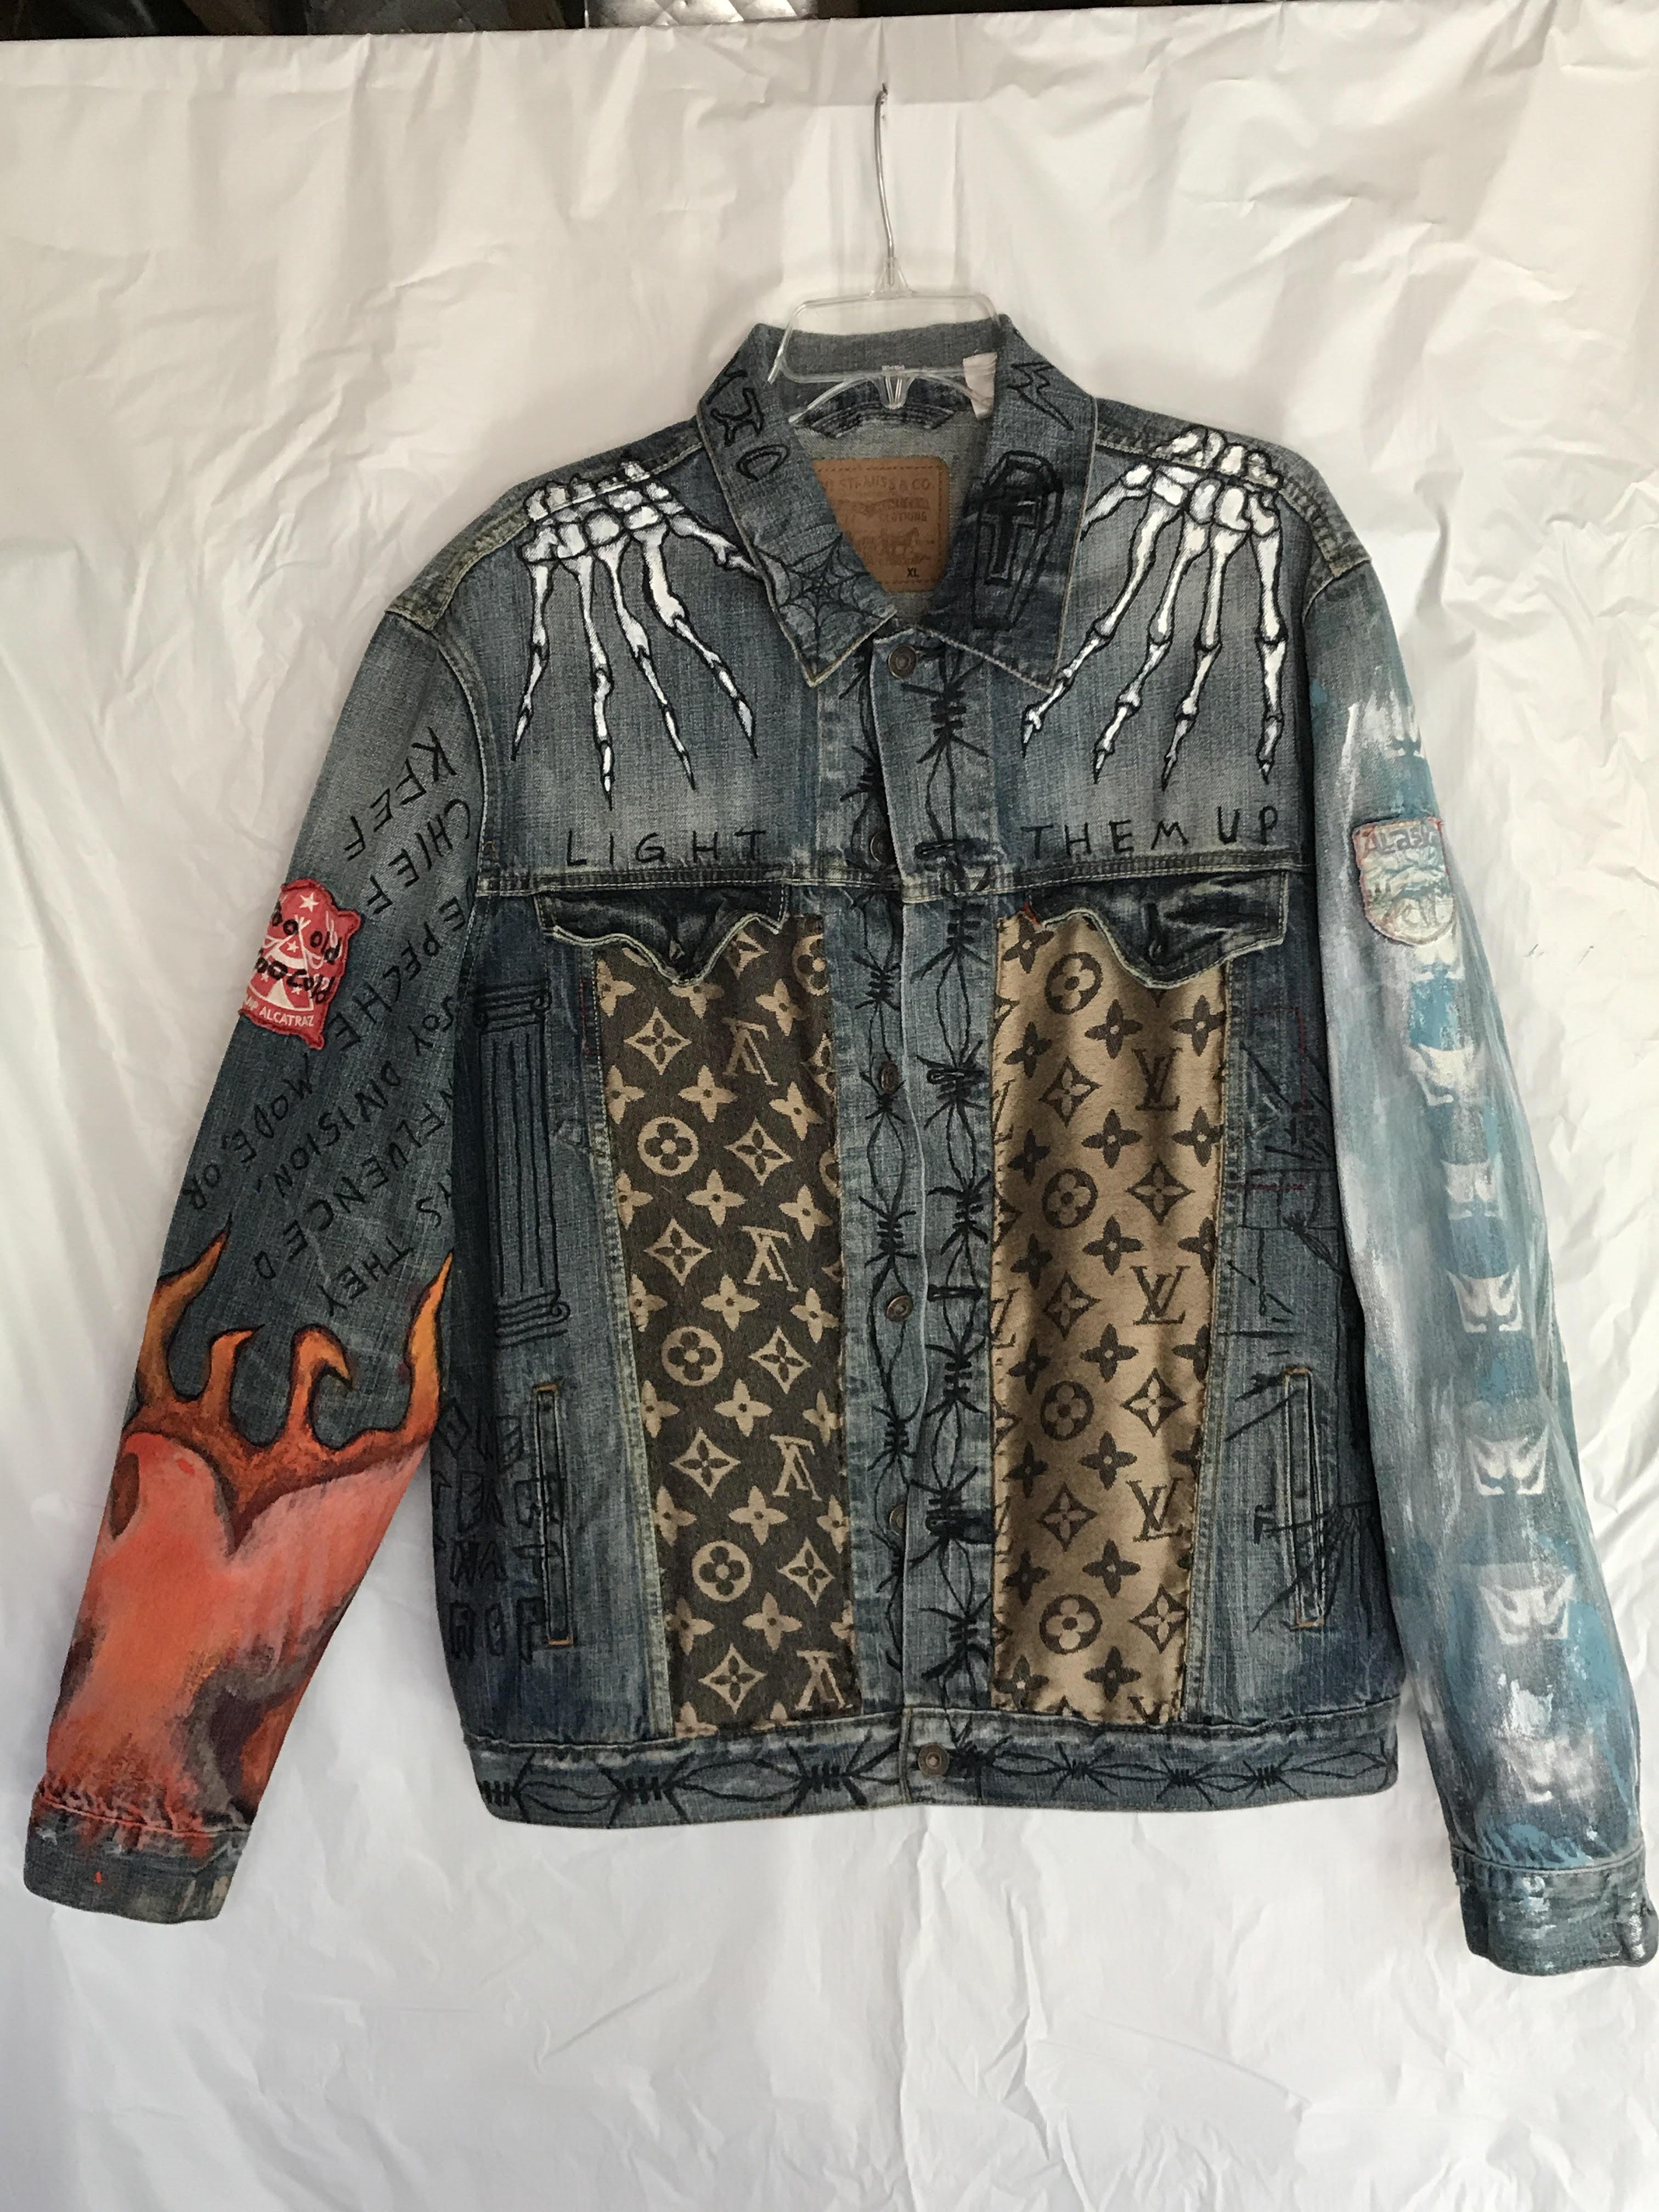 7d9e6a28cf21 Custom Hand-Painted Denim Jacket Size xl - Denim Jackets for Sale ...